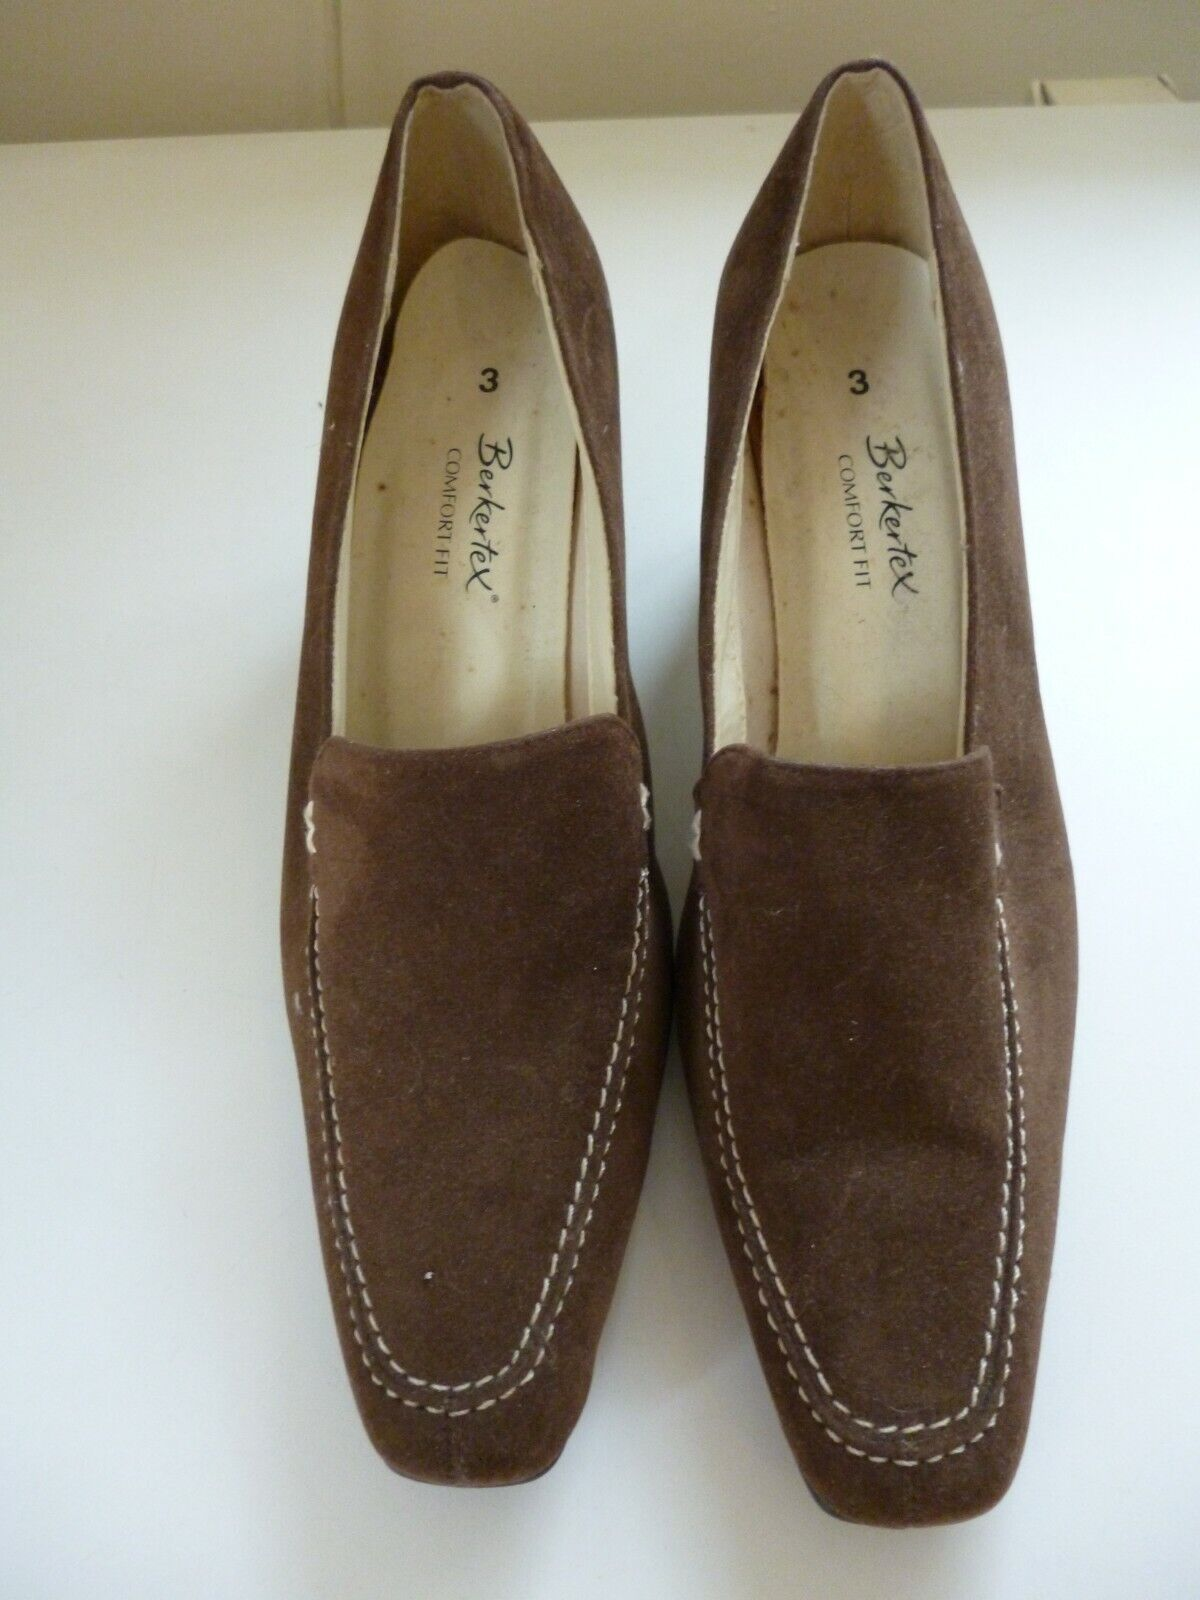 BNWOB Berkertex comfort fit brown suede shoes size 3